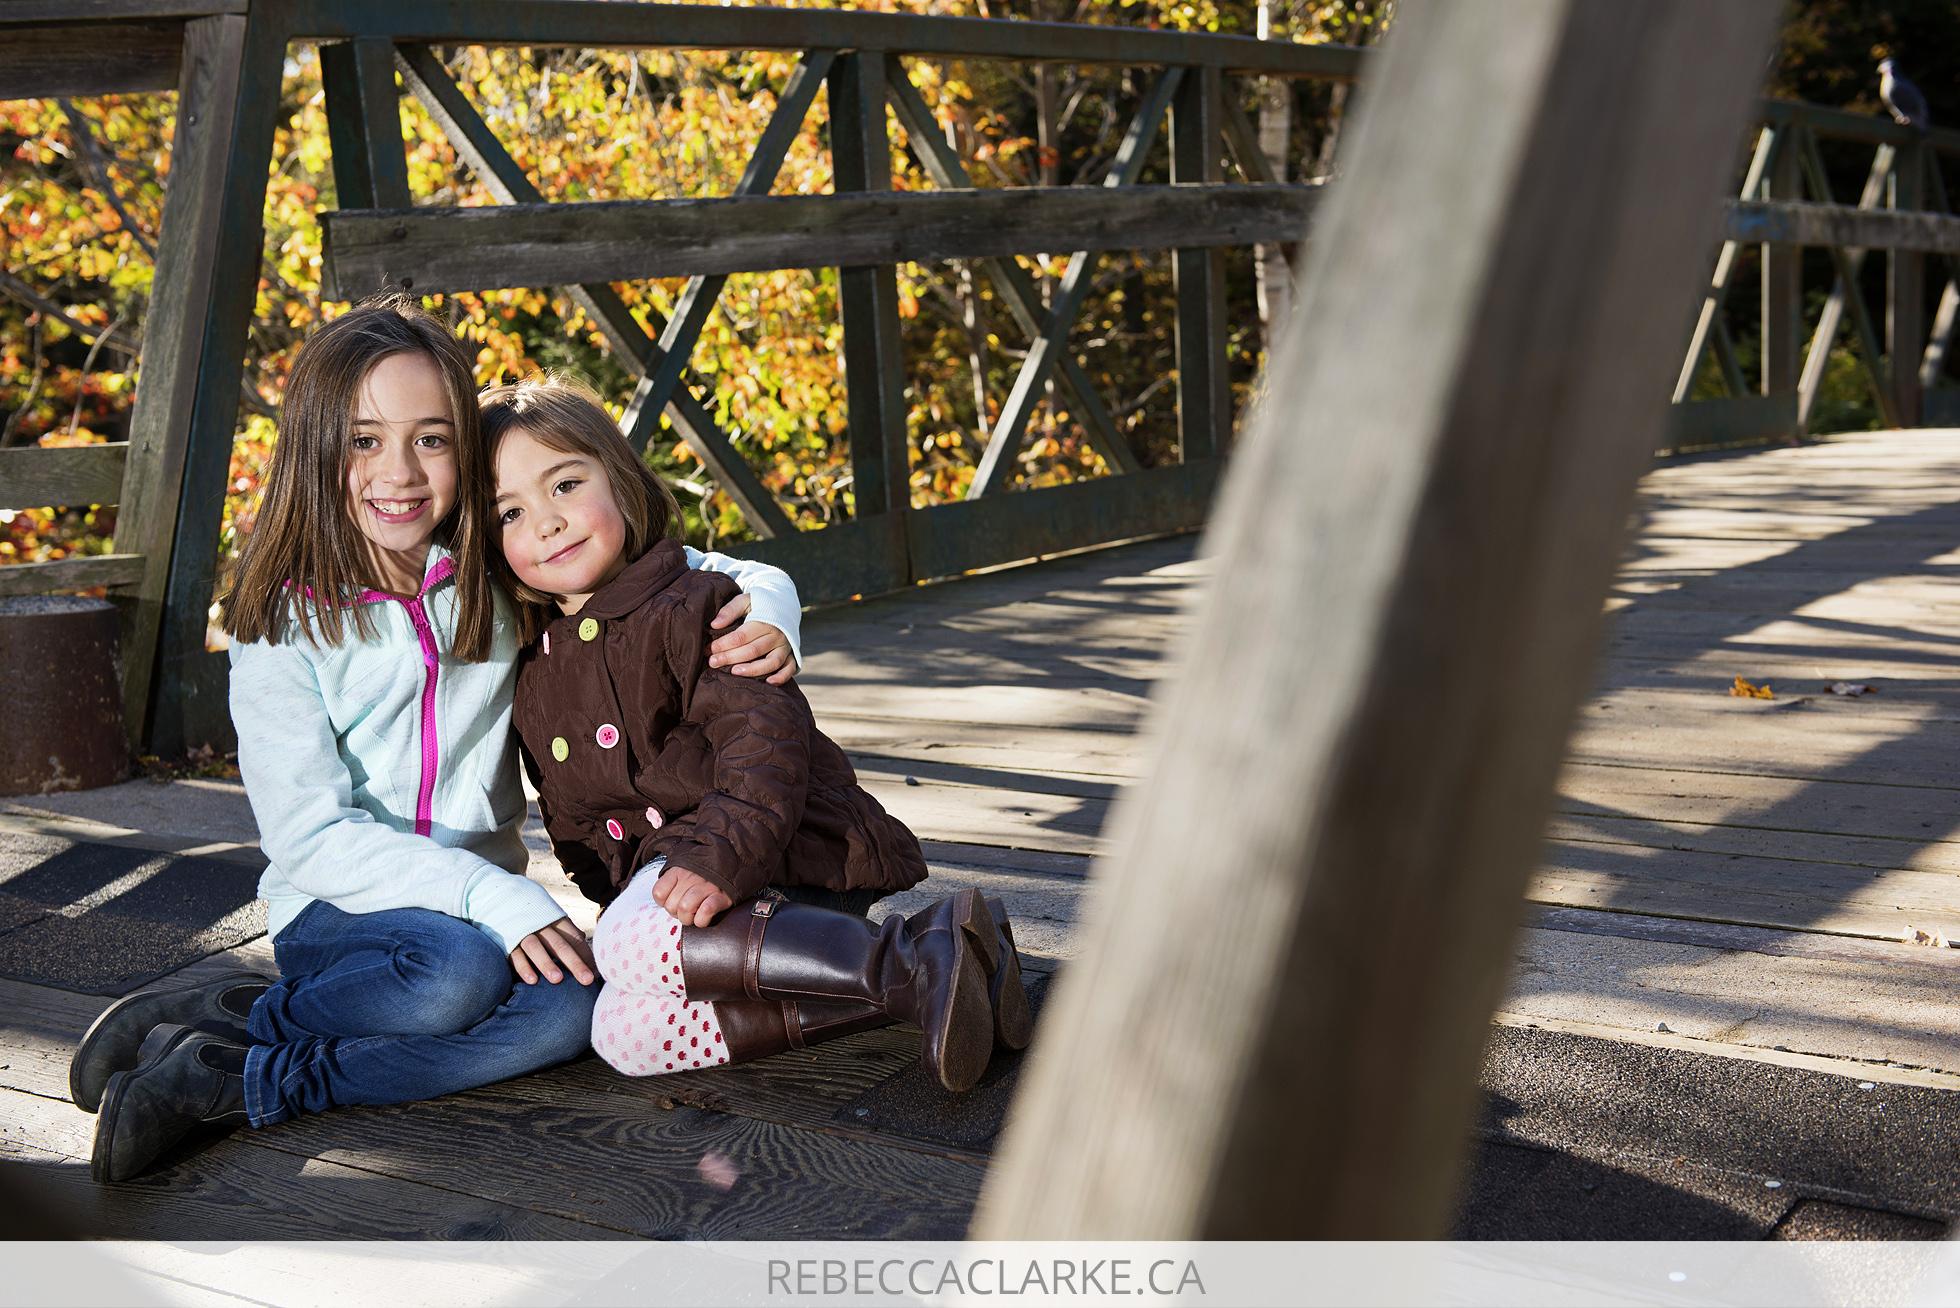 Family photos at Shubie Park in Dartmouth